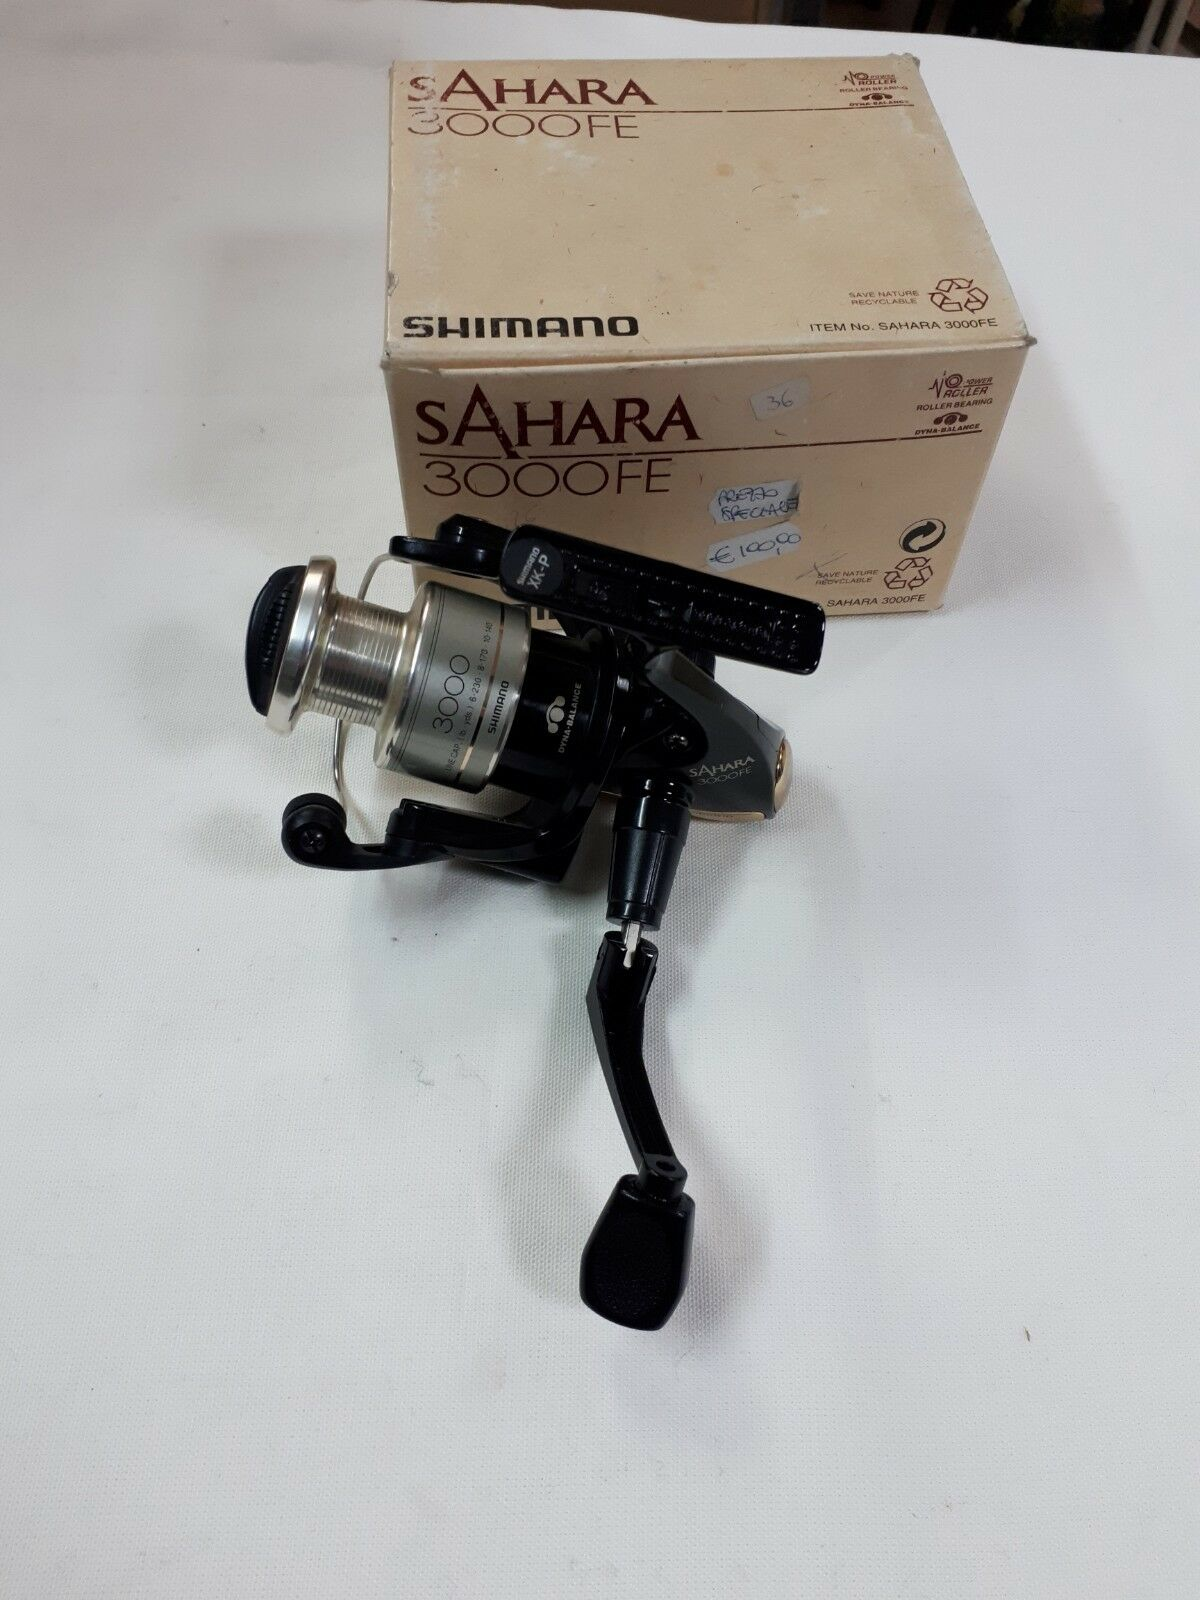 Mulinello Shimano Sahara 3000fenuovissimoofferta Fine Serie